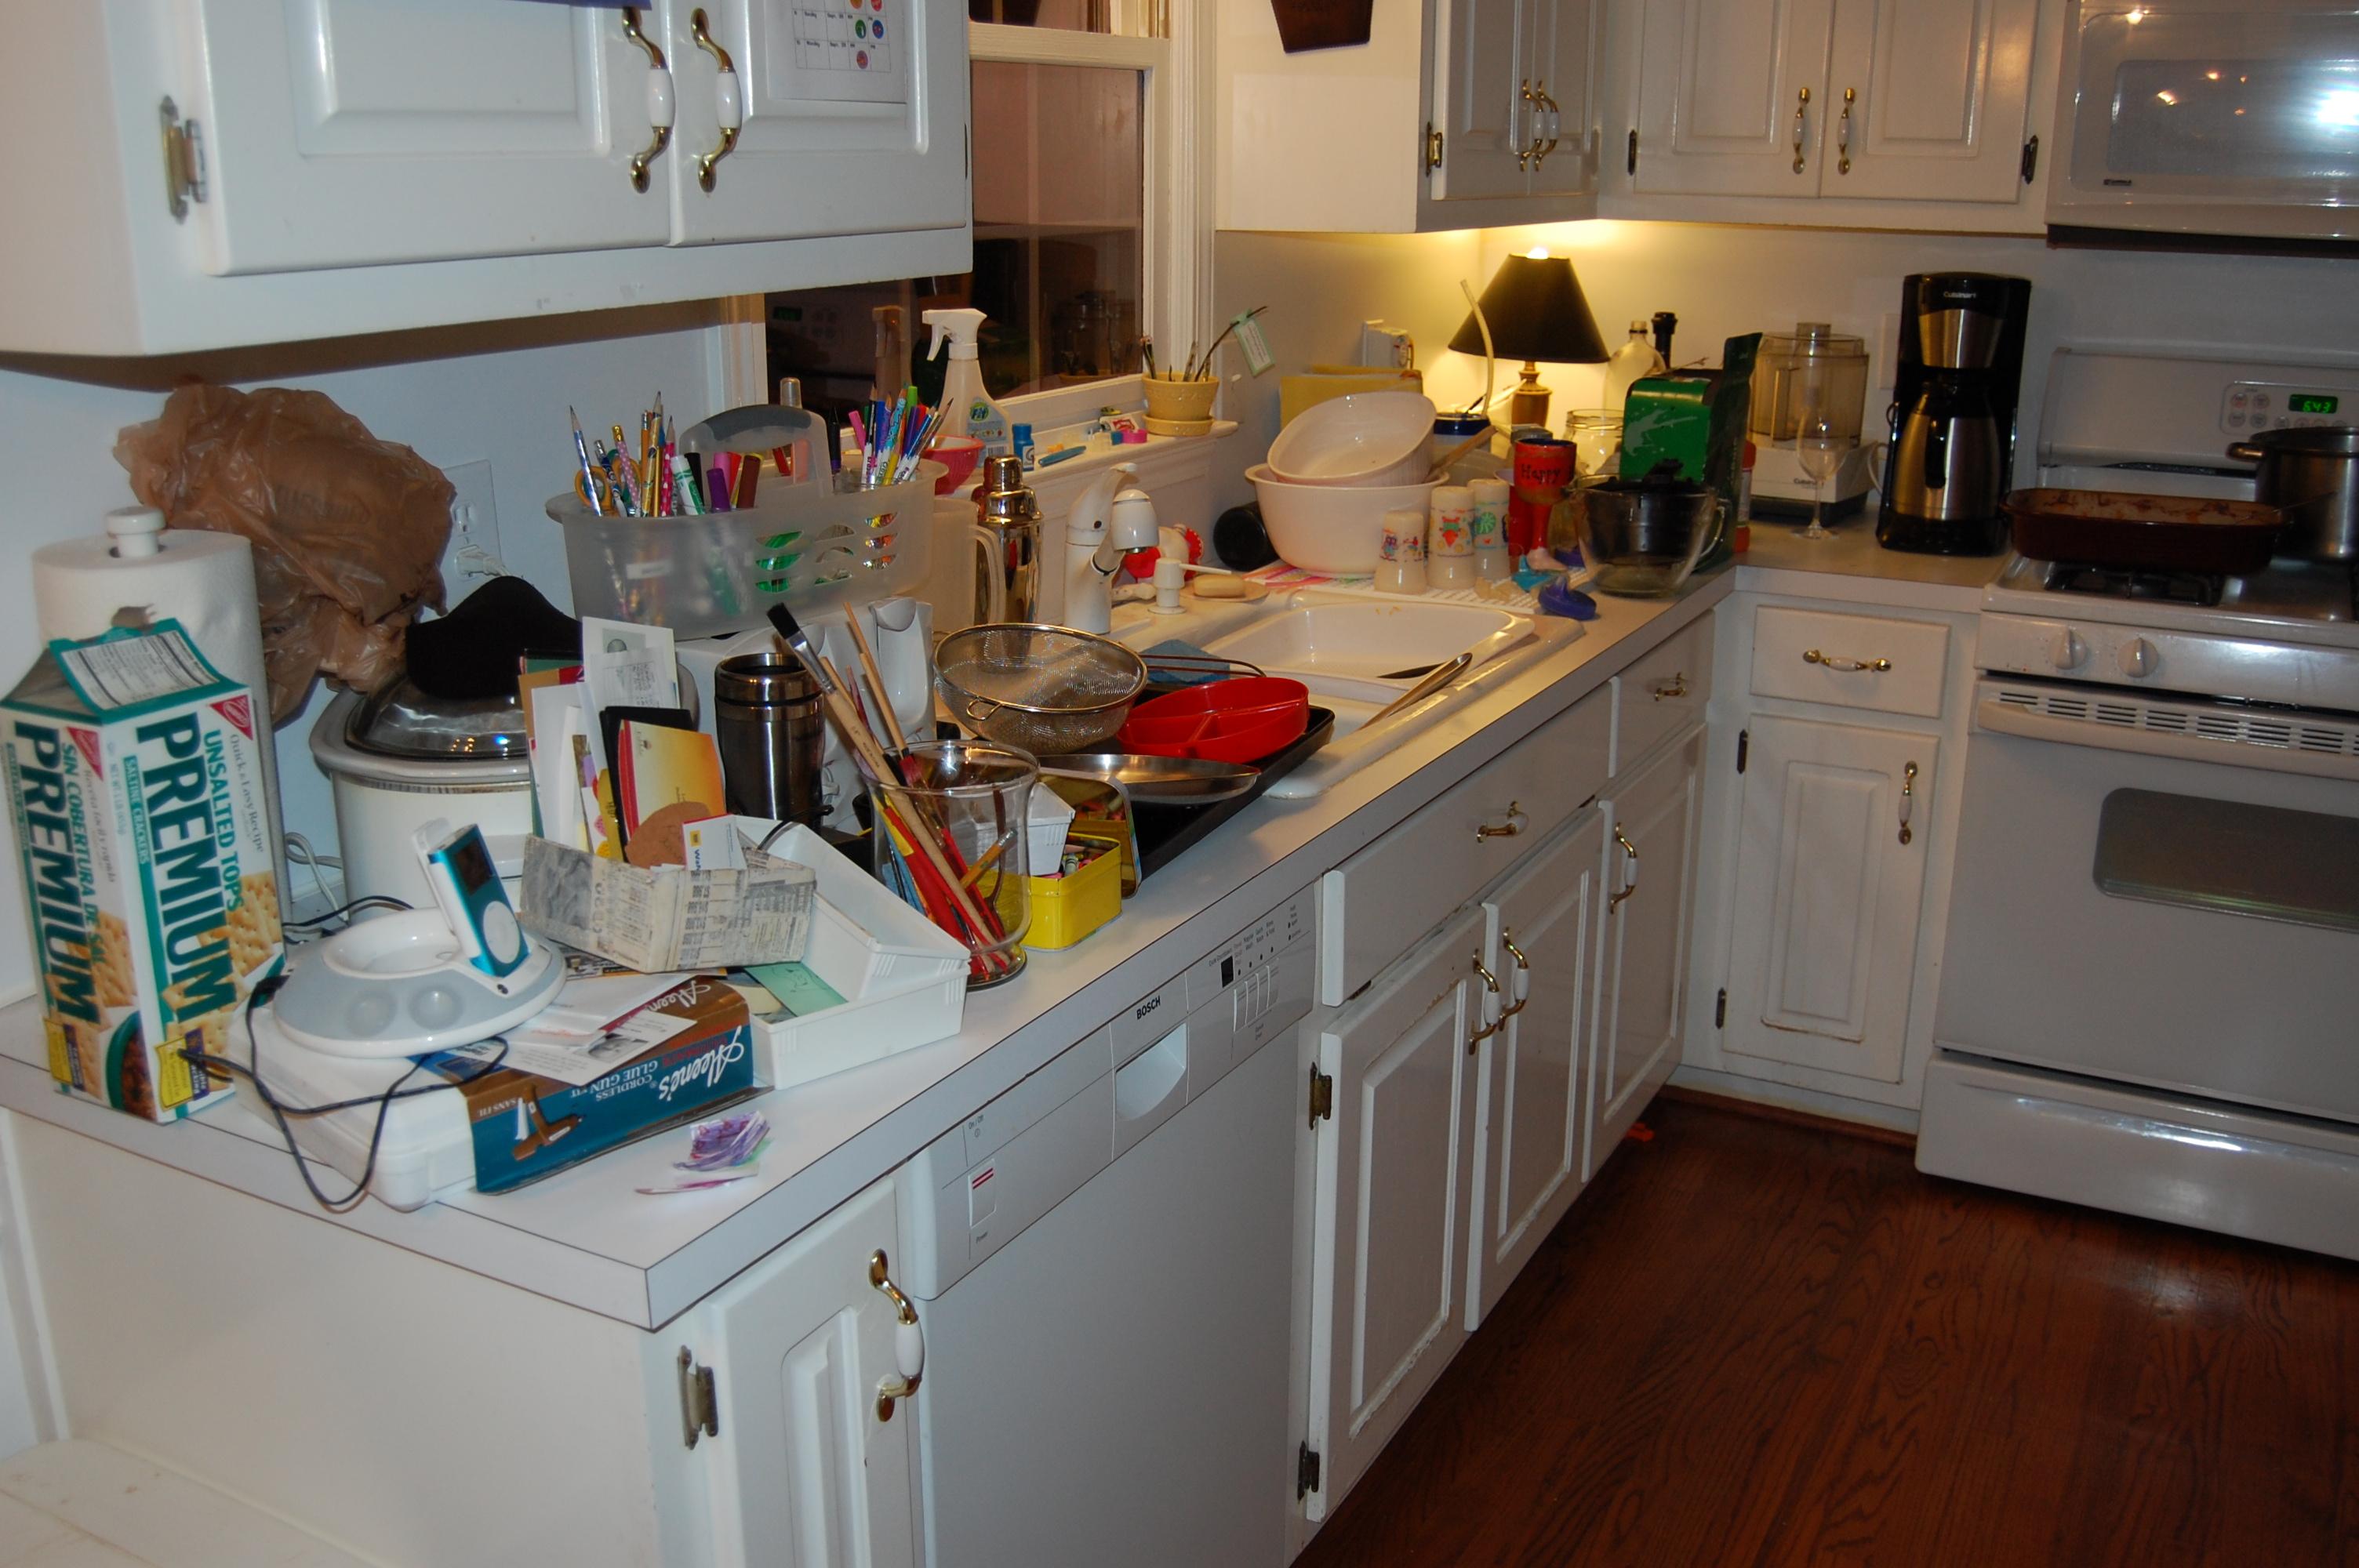 Messy Kitchen Countertop Messy Kitchen Grill Messy Kitchen